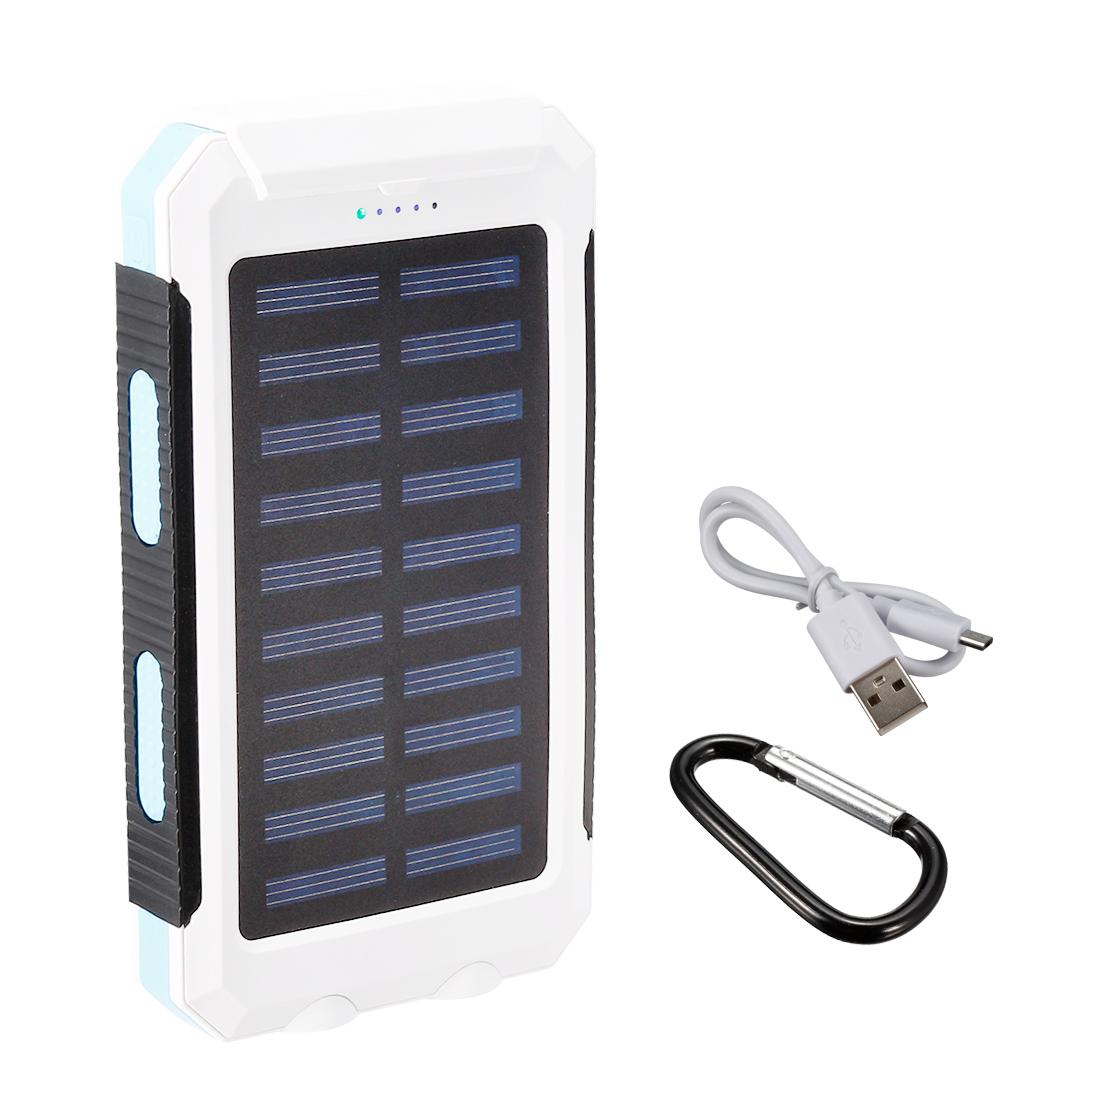 1.5W 8000mAh Solar Charger Dual USB Power Bank Phone Battery Flashlight Blue